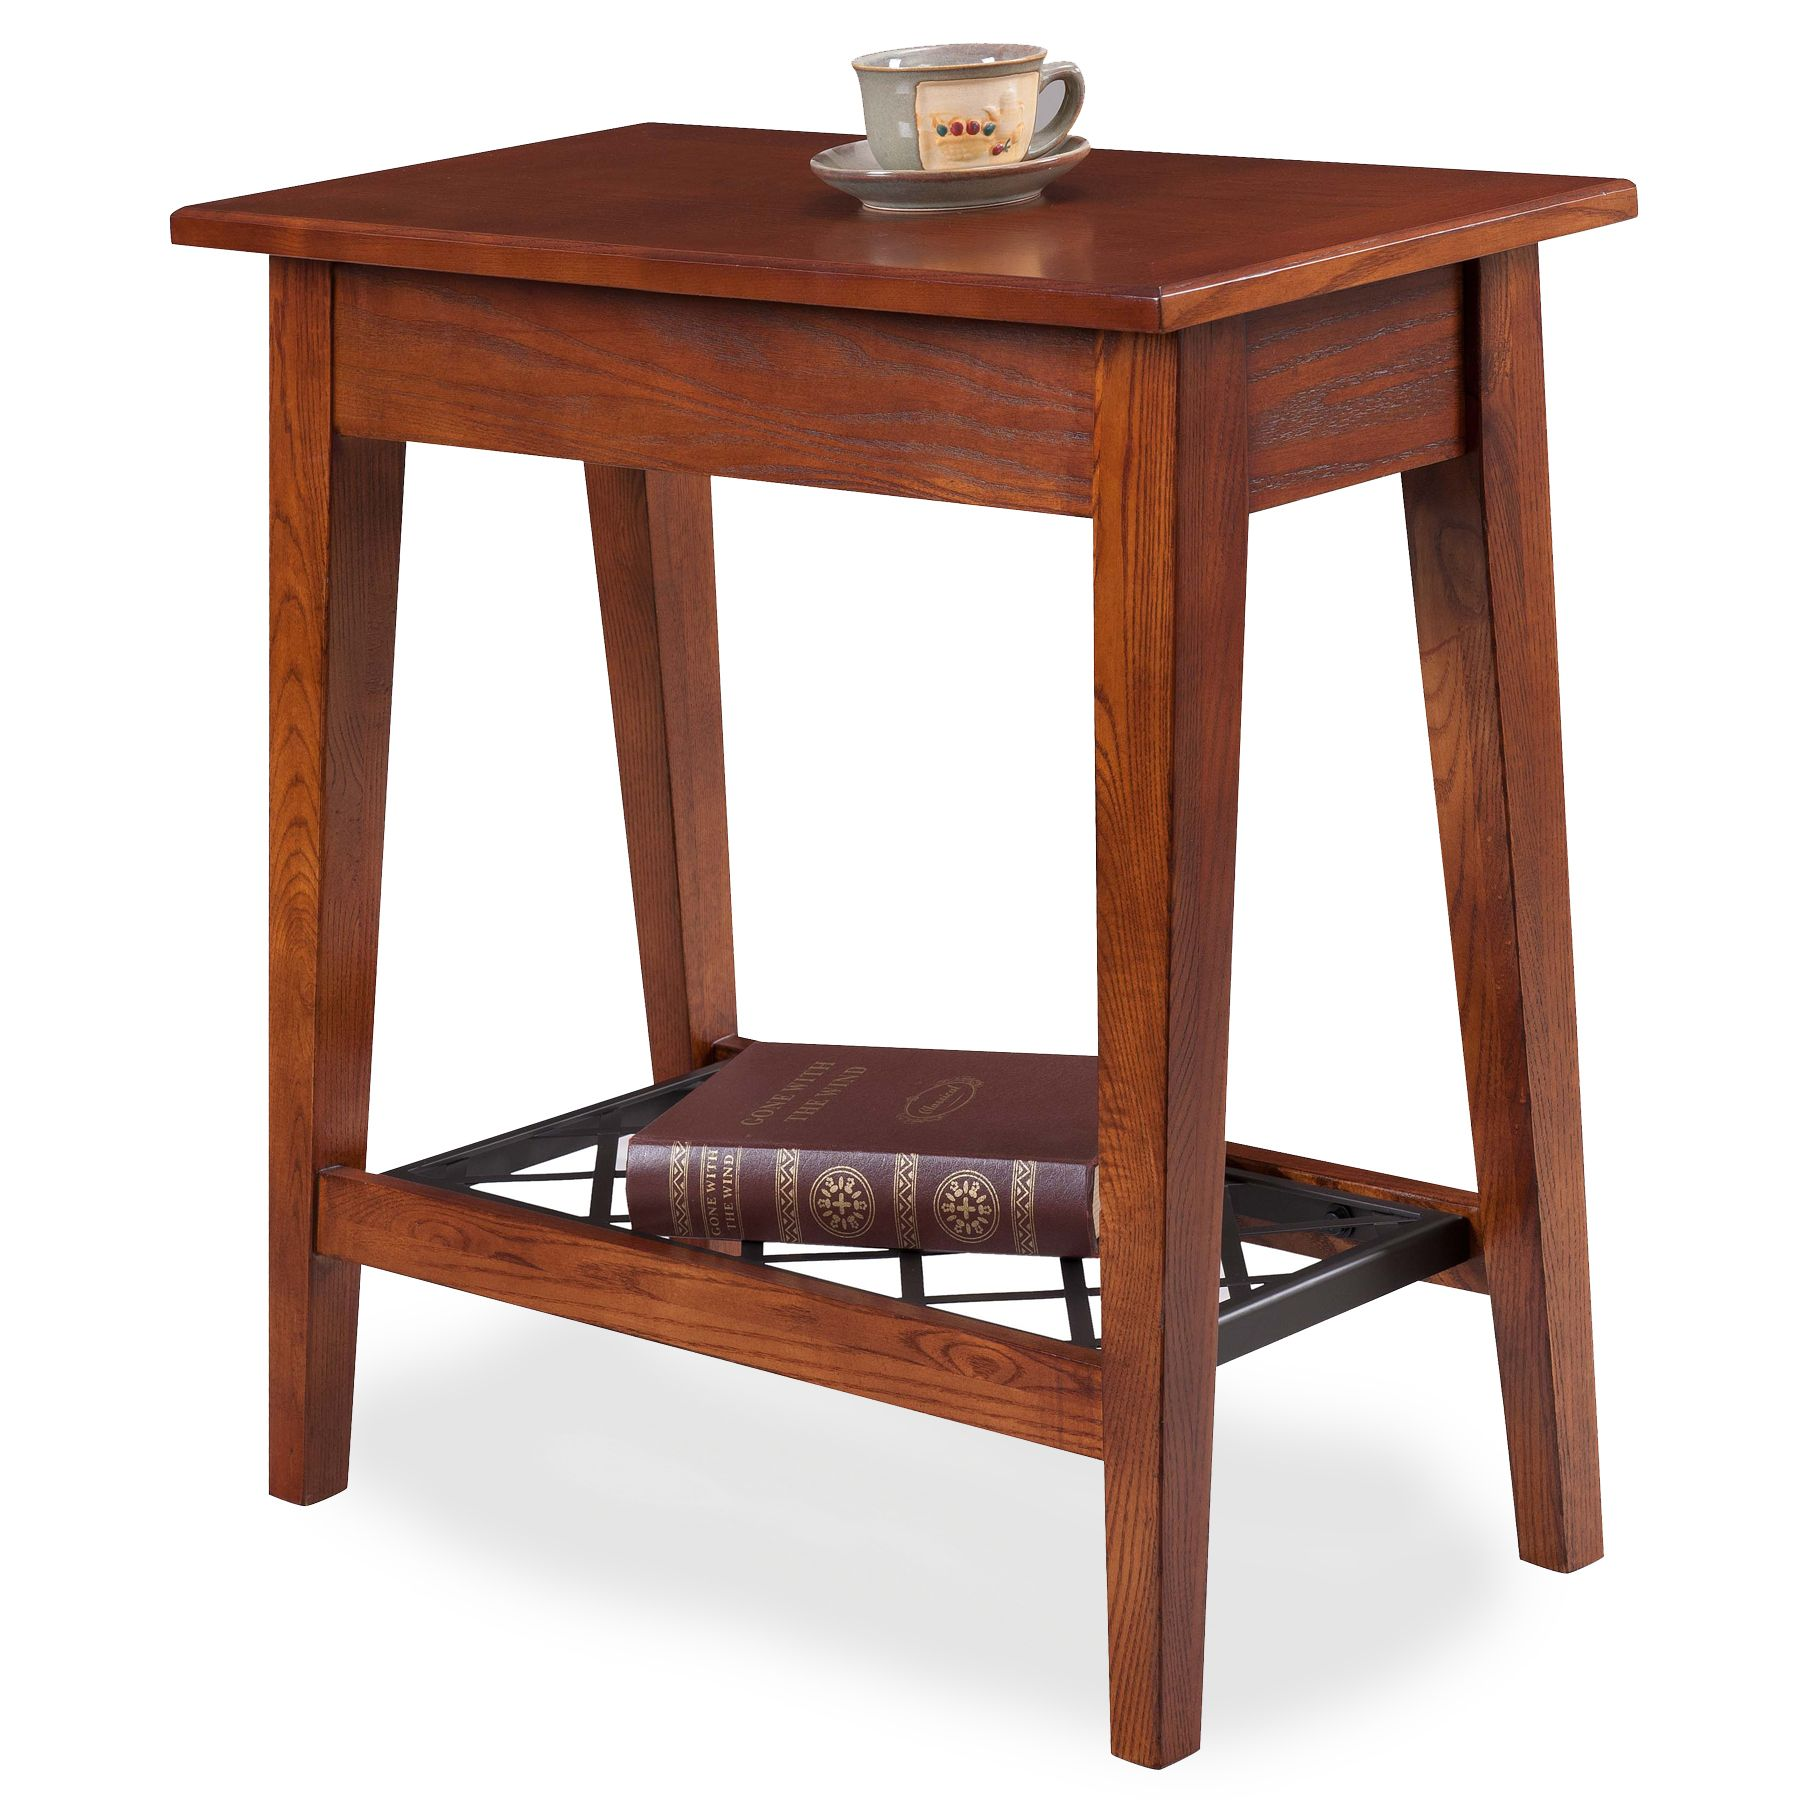 Leick Westwood Oak Narrow Chair Side Table, Silver